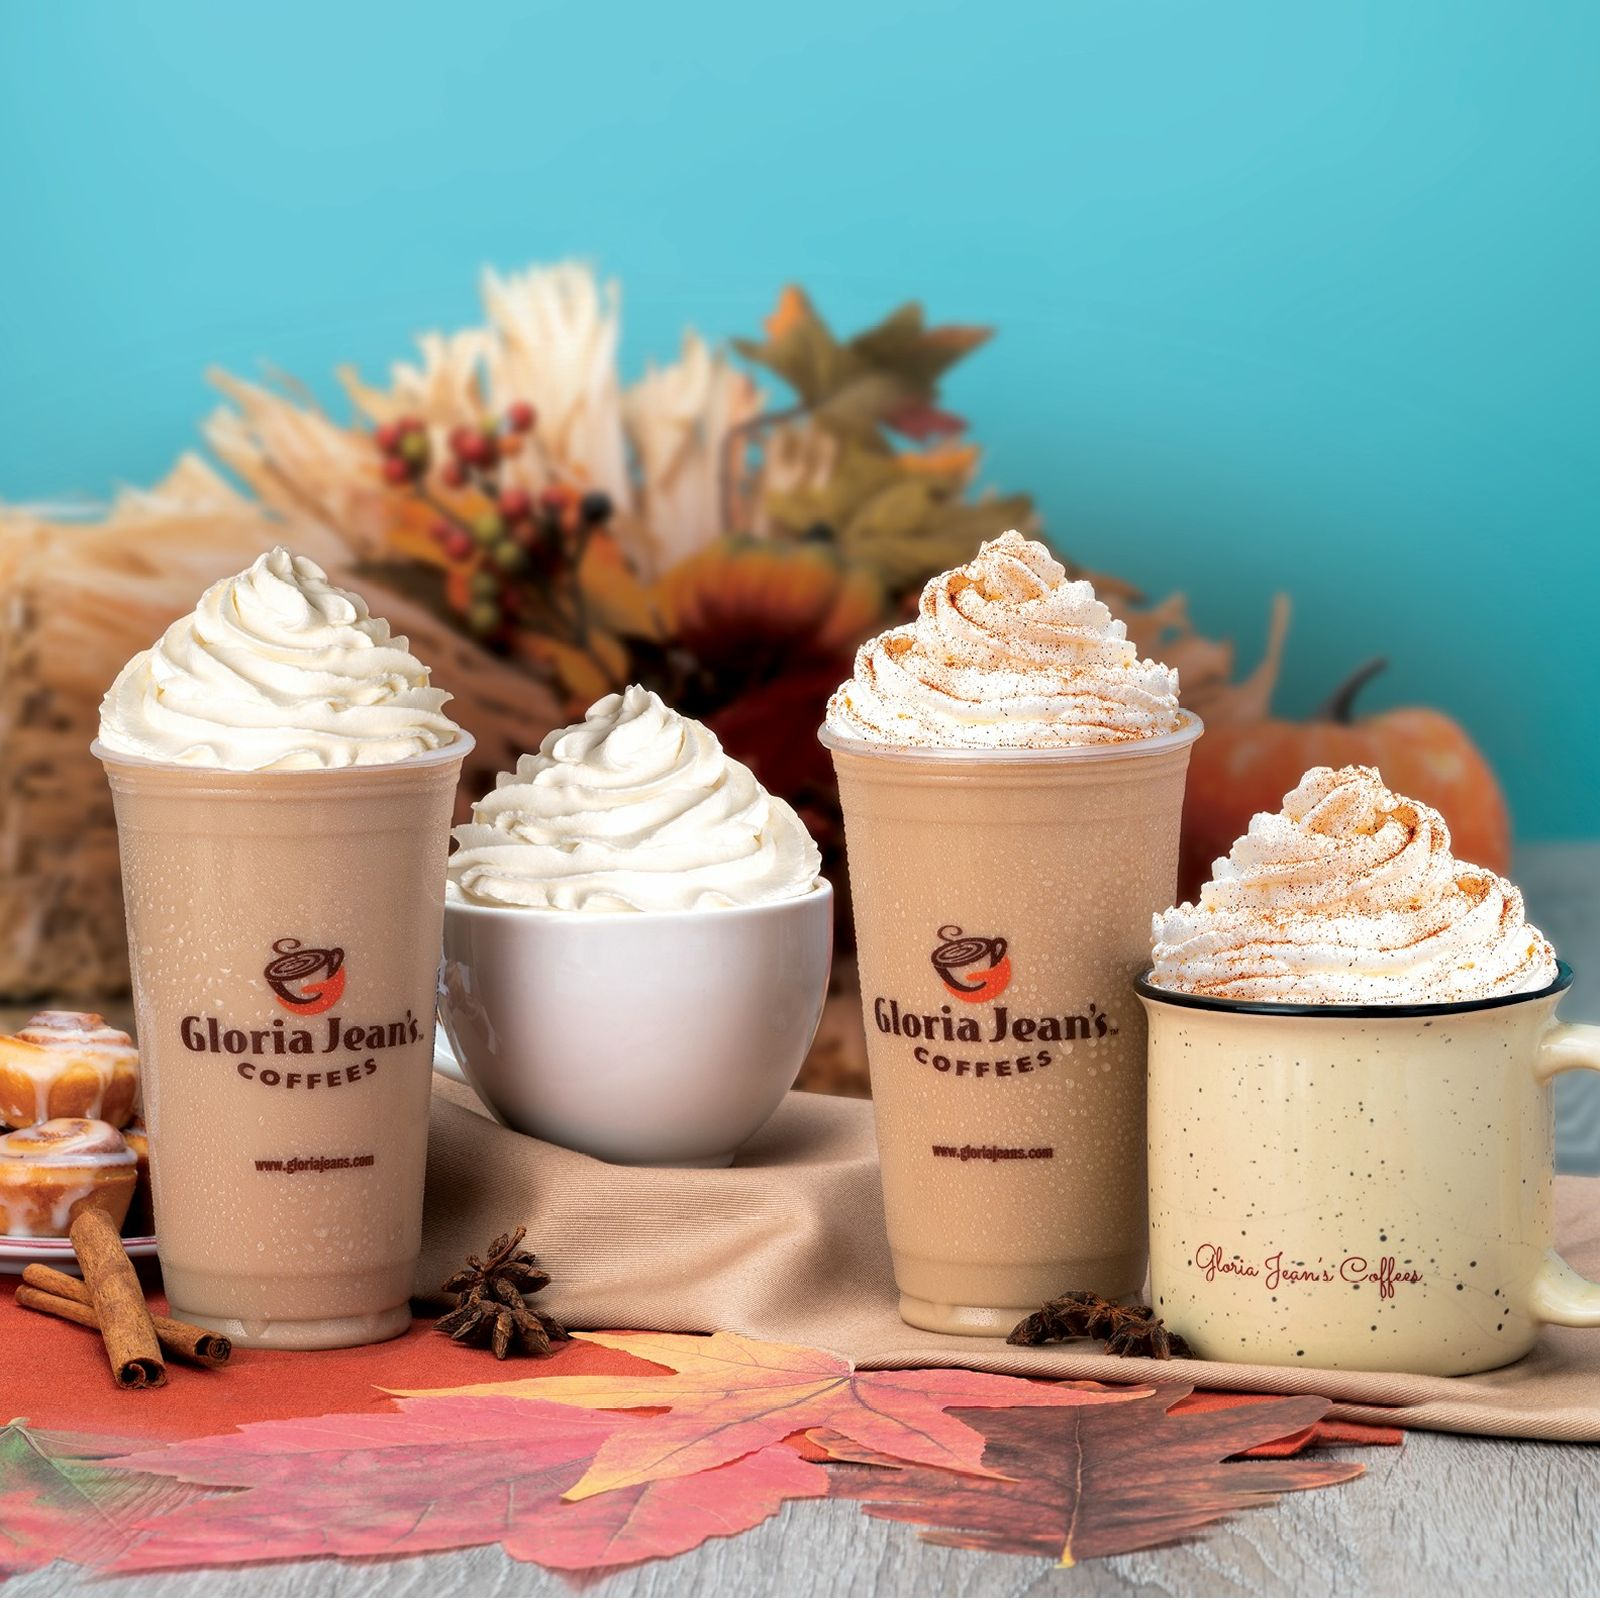 Gloria Jean's Coffees Fall Seasonal Cinnamon Bun and Pumpkin Spice Chiller & Lattes